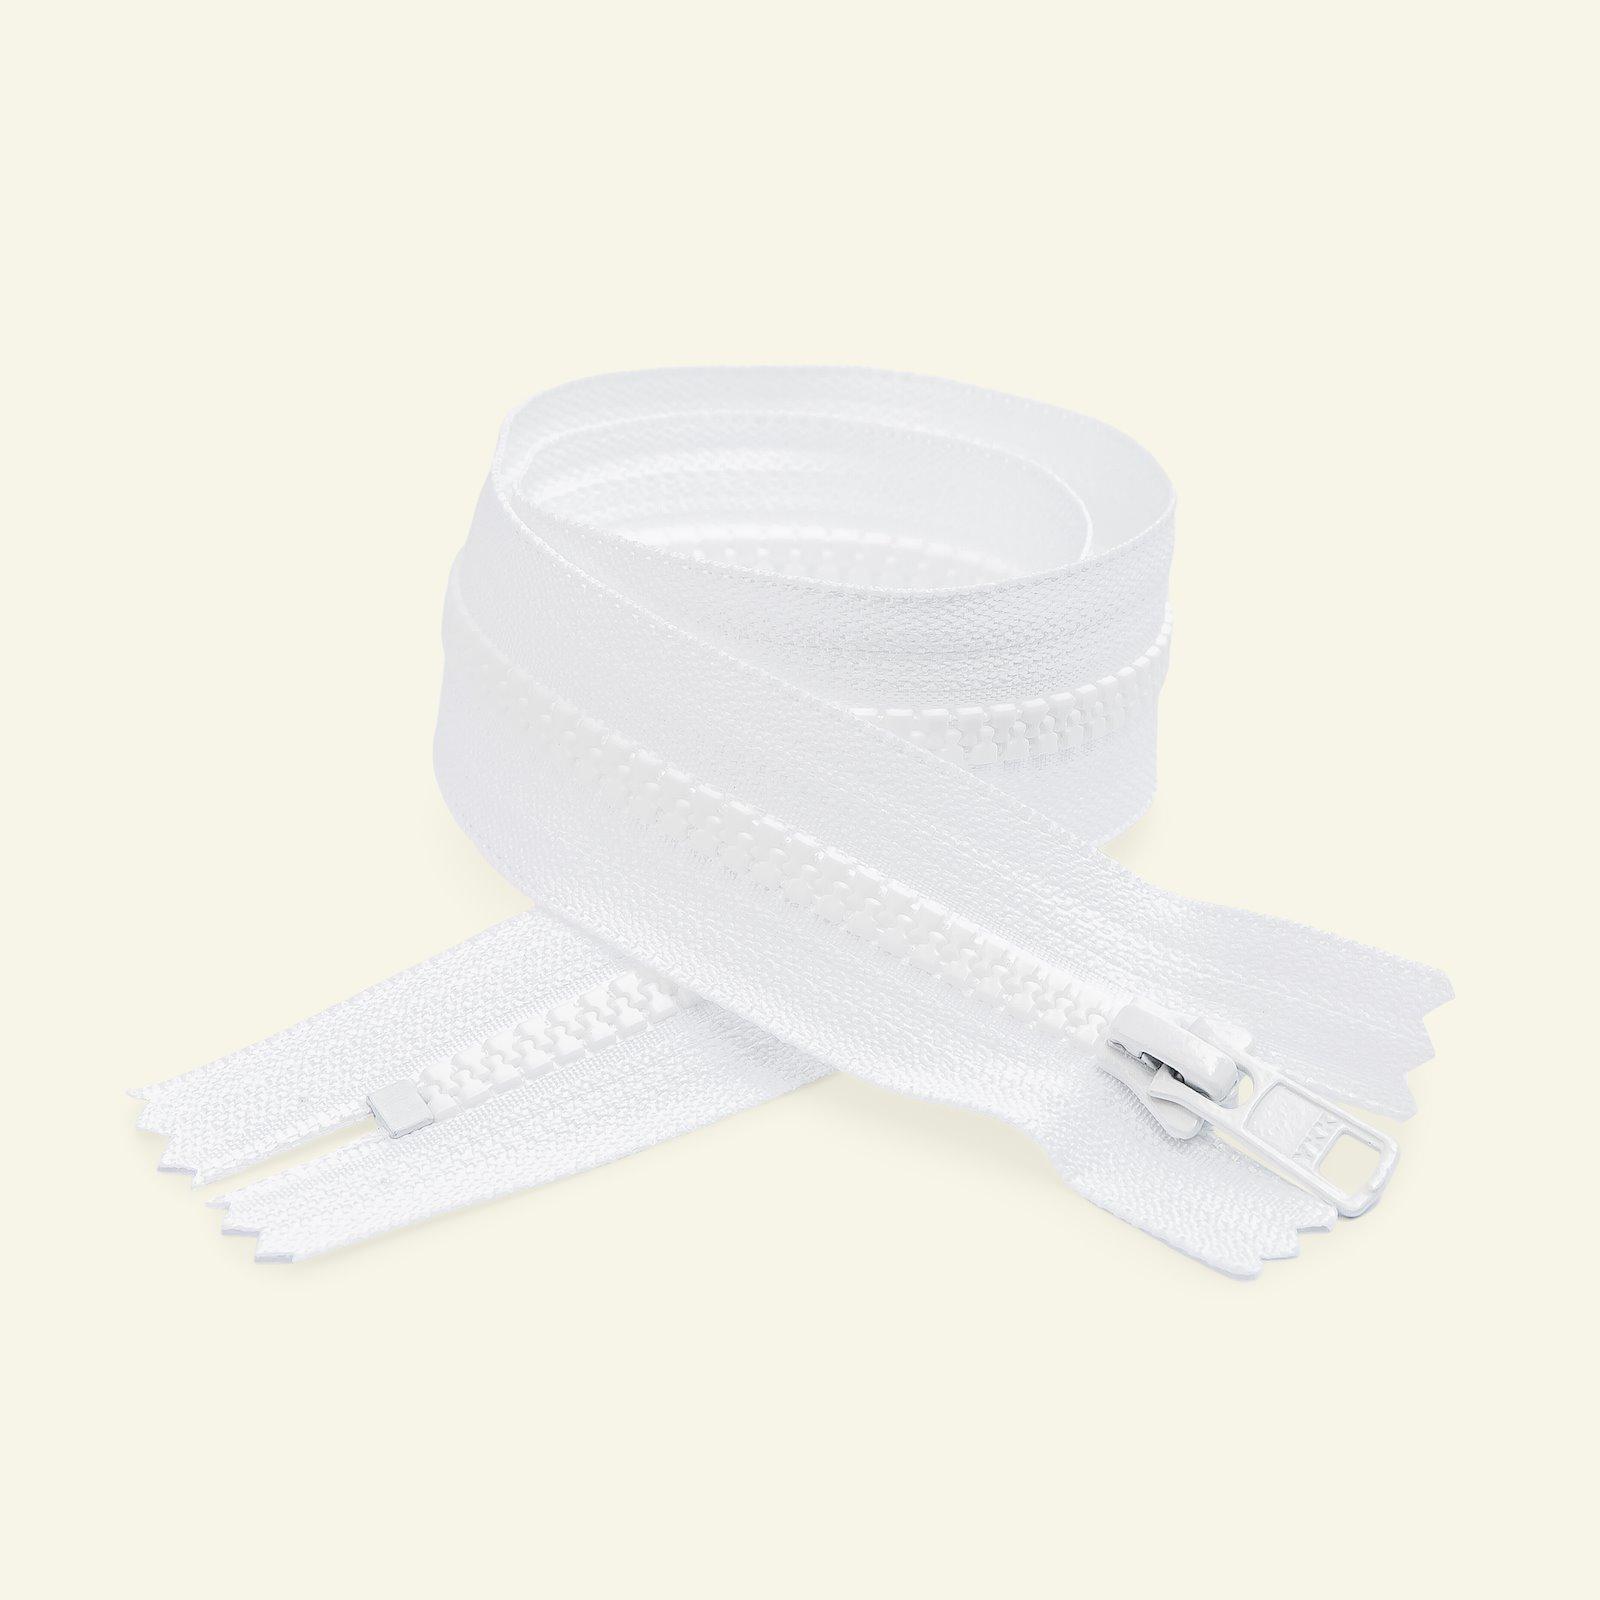 YKK zip 6mm closed end 35cm white x50101_pack